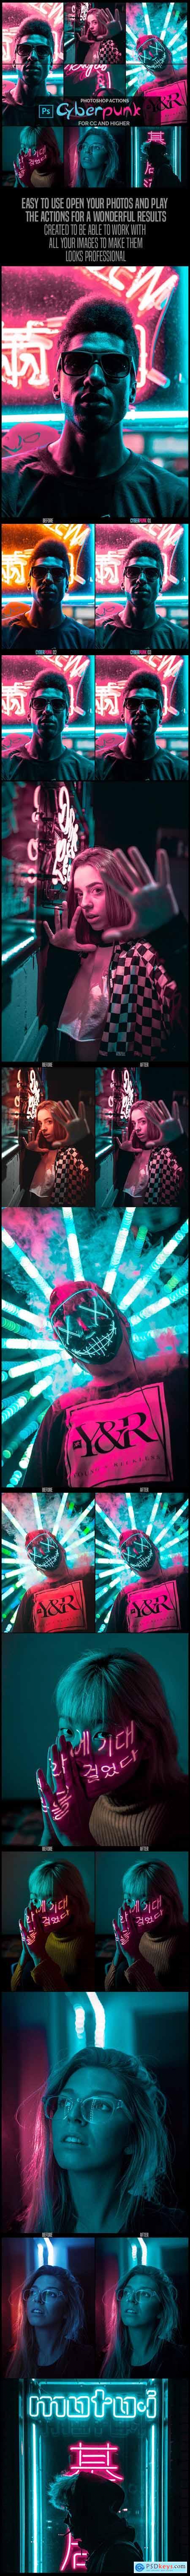 Cyberpunk - Photoshop Actions 26311519